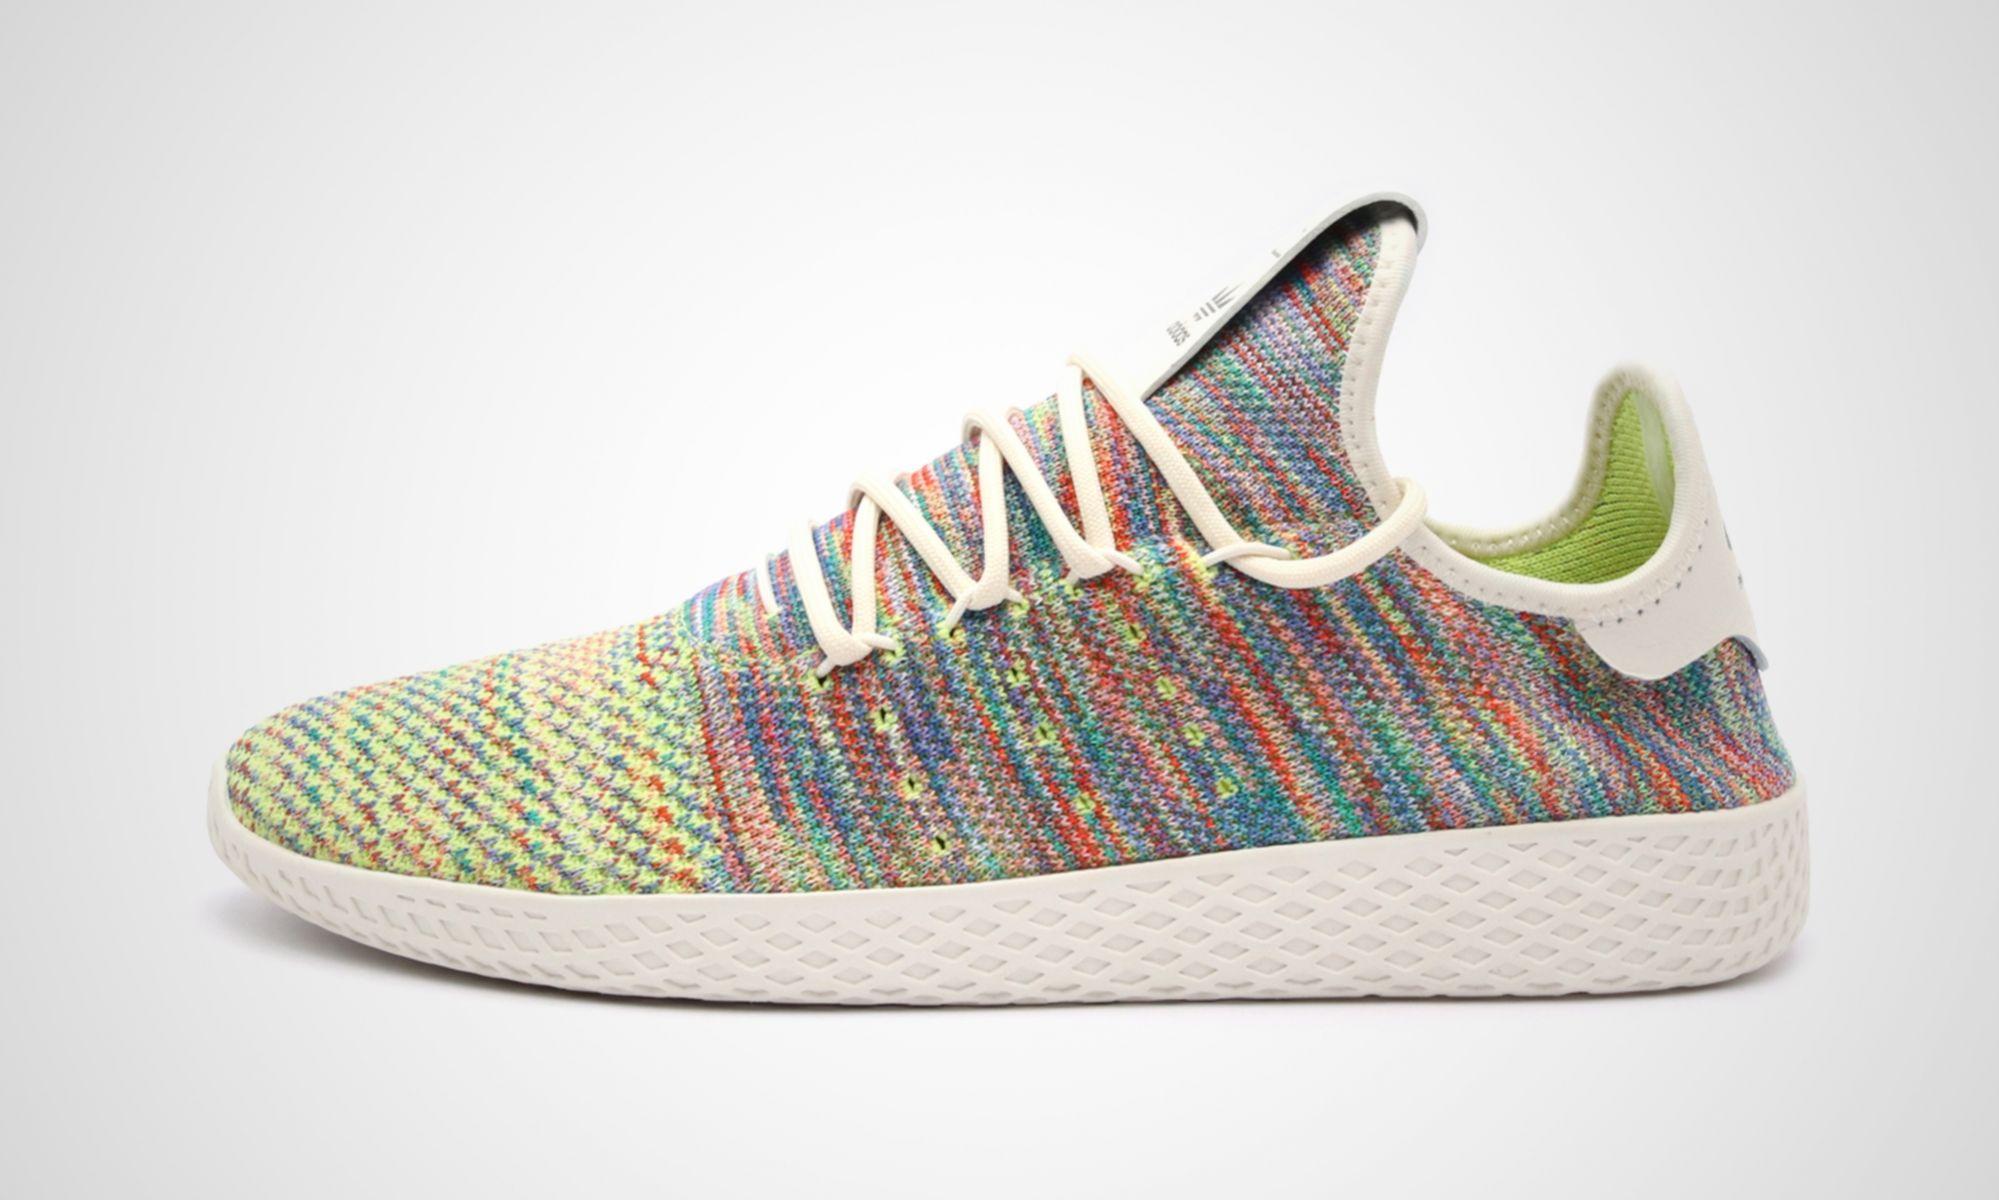 adidas Tennis HU Multicolor by Pharrell Williams